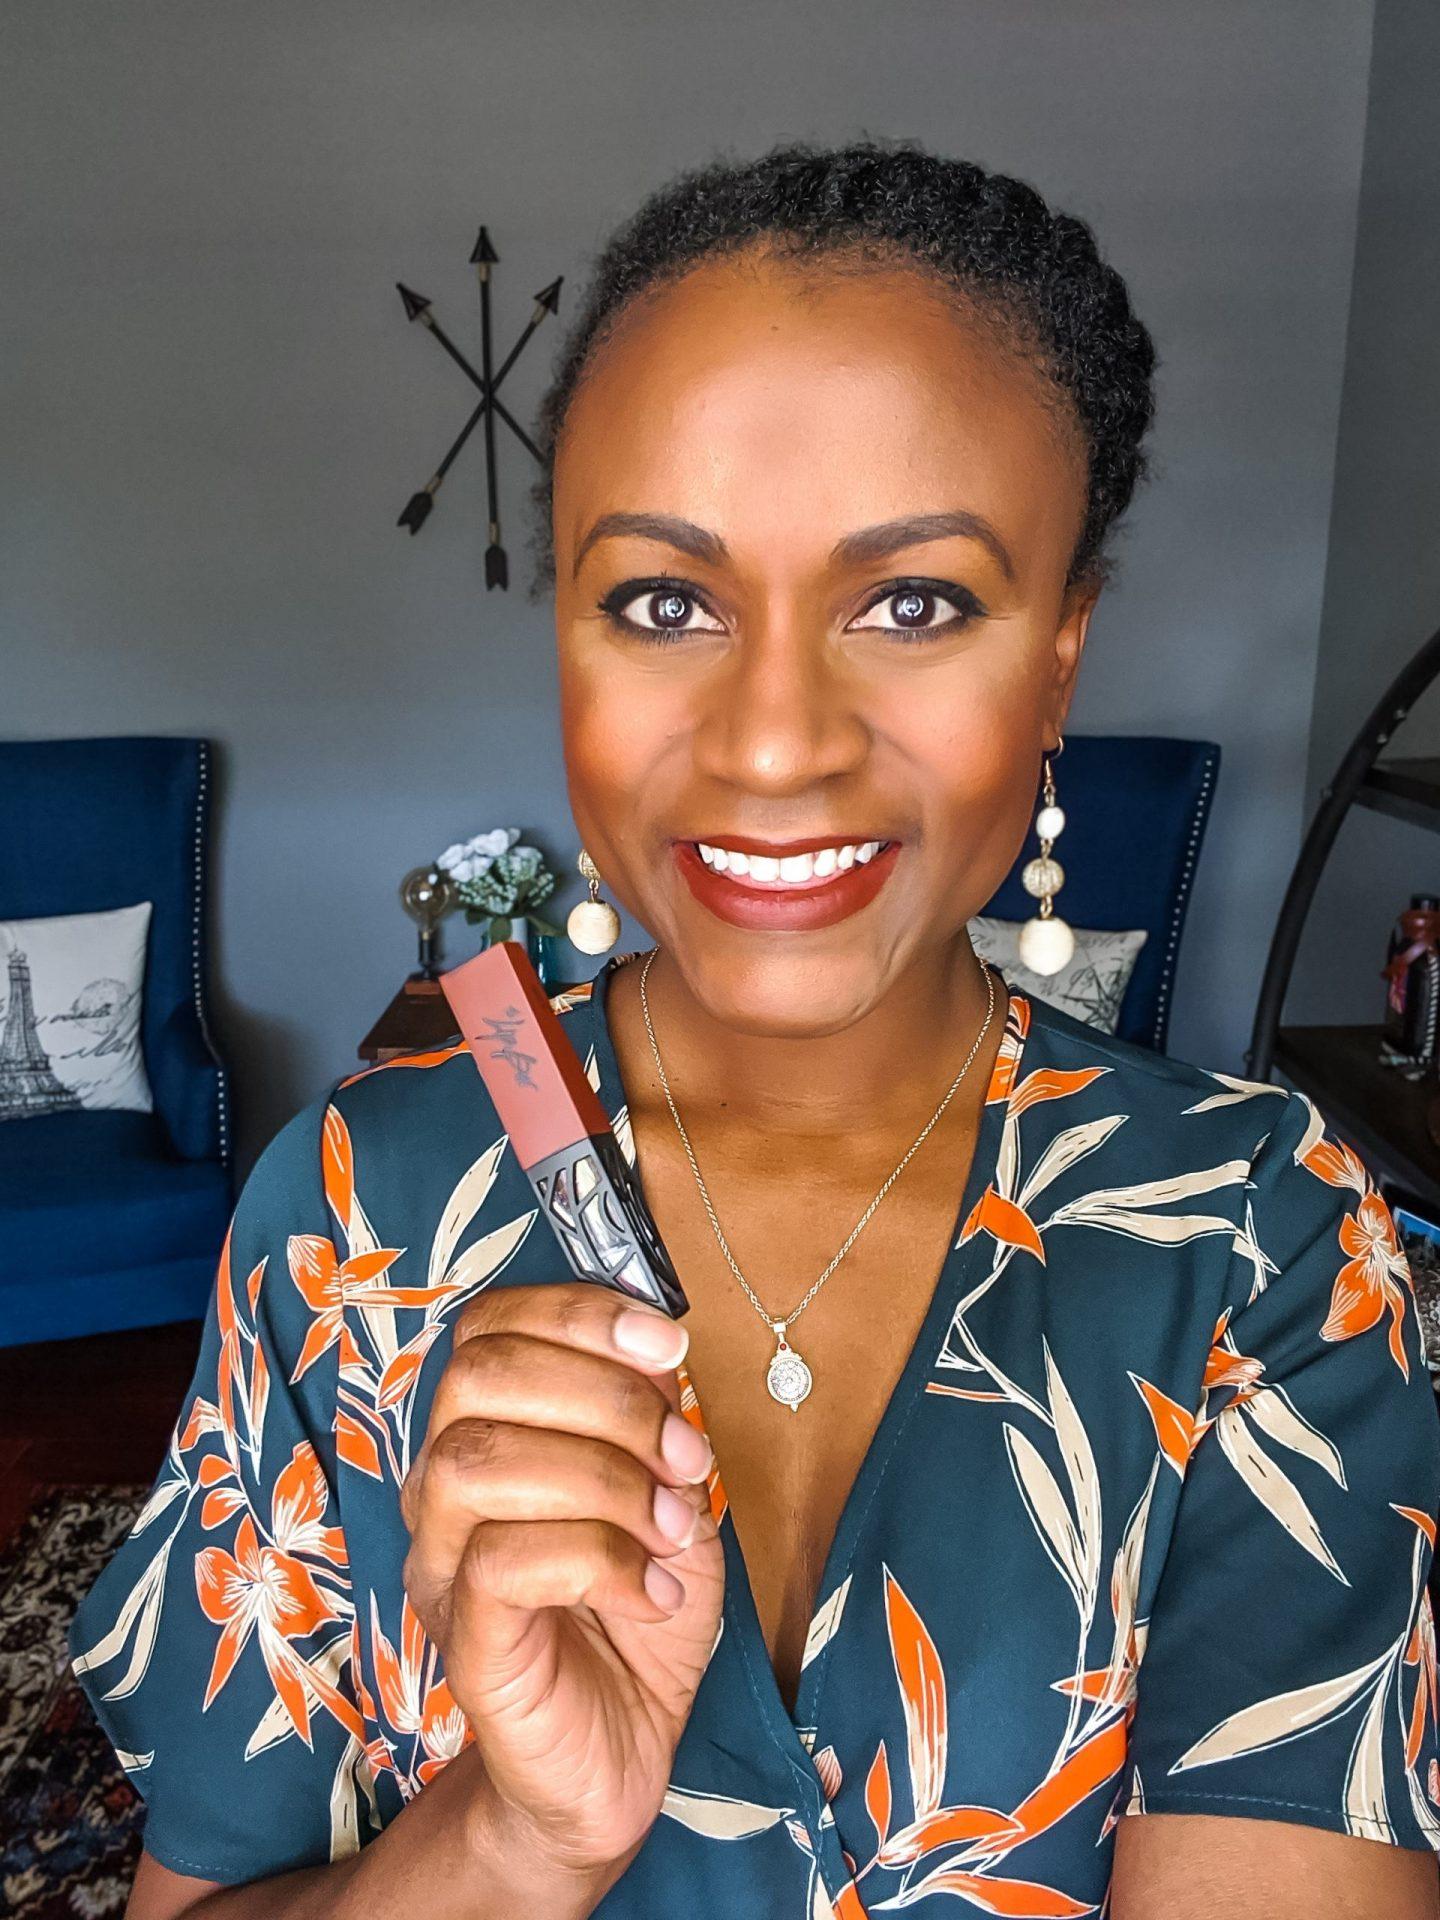 Let's Talk About Black Beauty